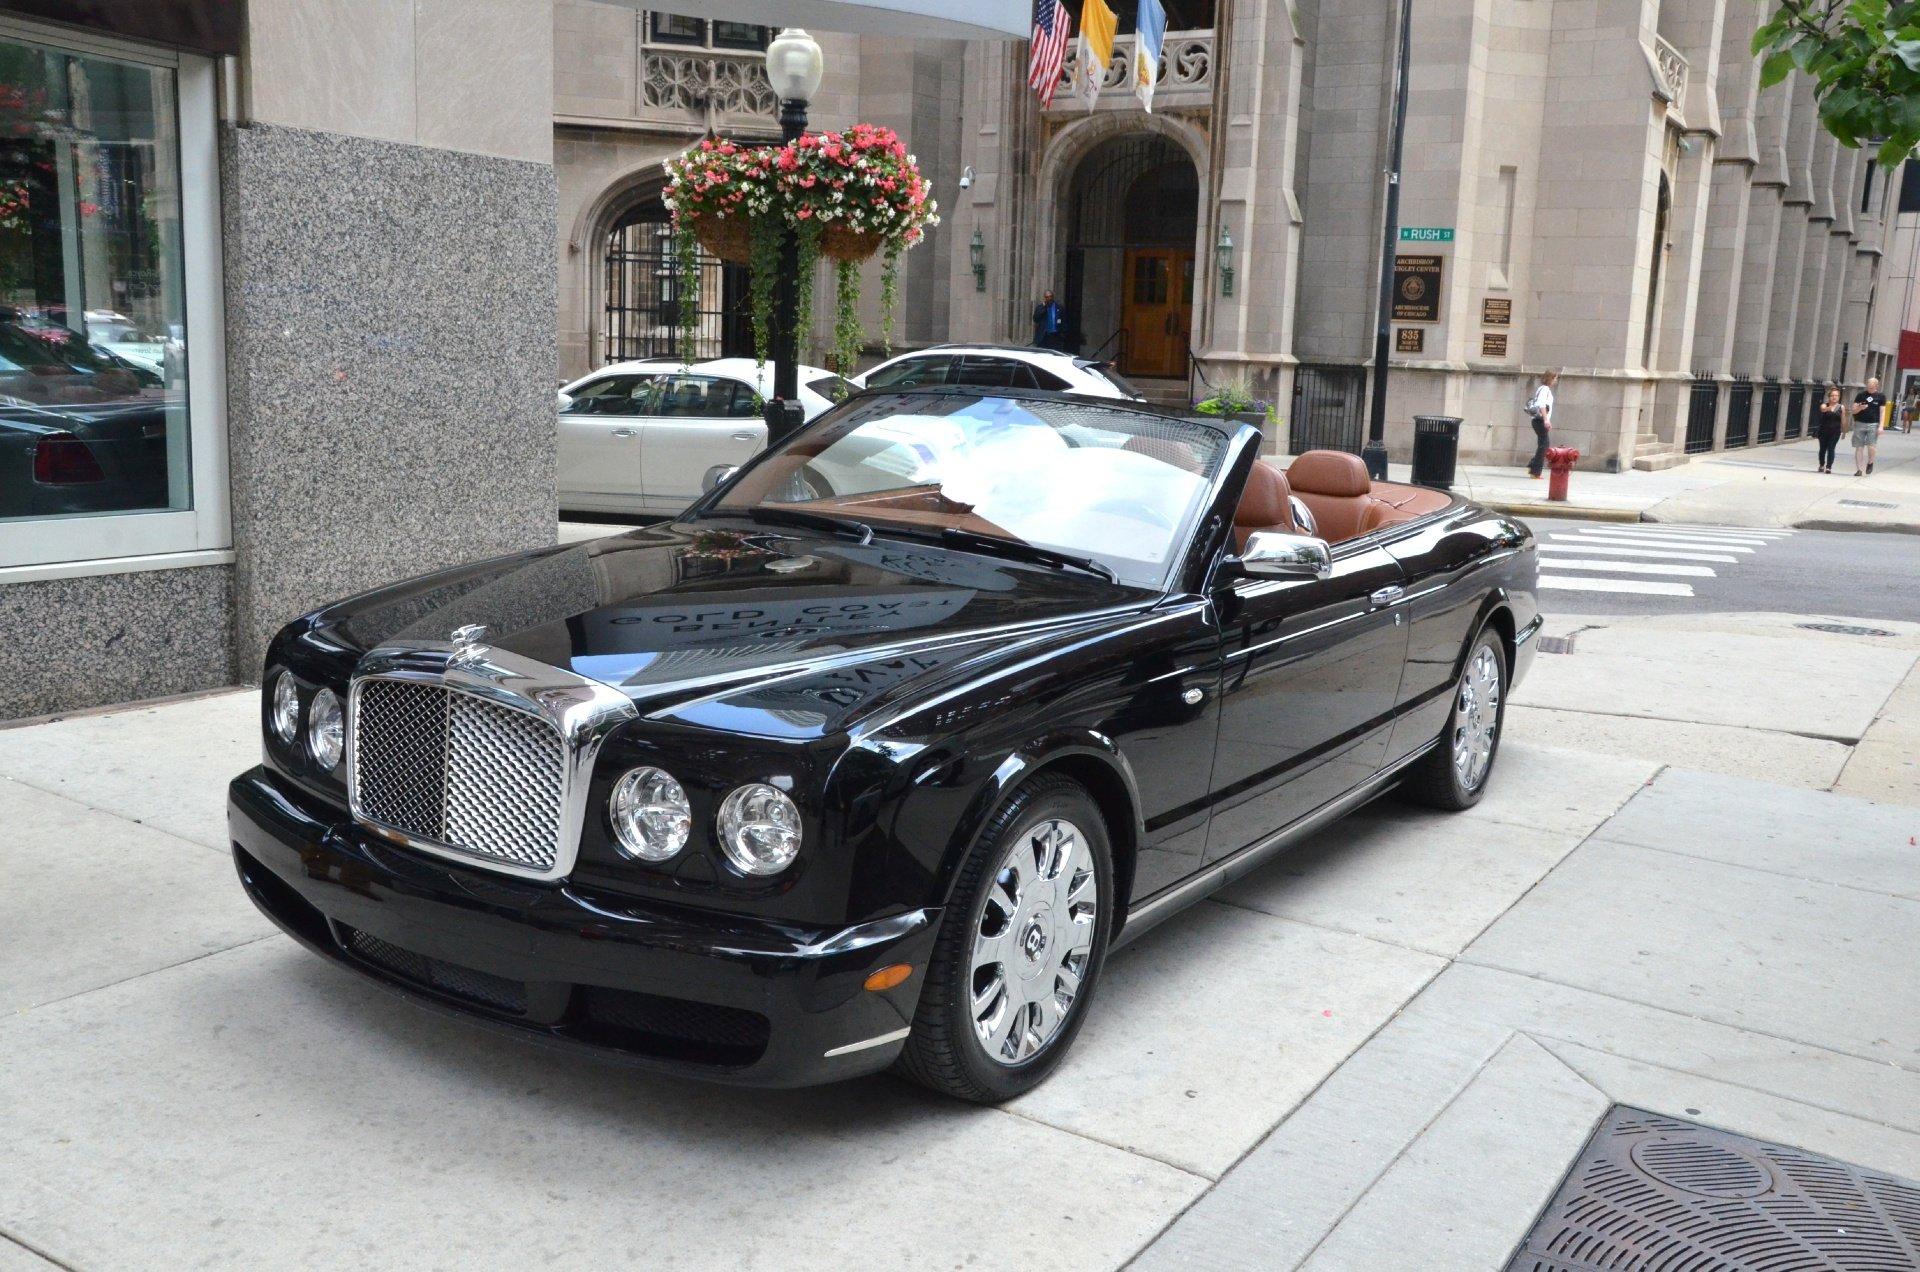 2007 bentley azure convertible cabriolet luxury black. Black Bedroom Furniture Sets. Home Design Ideas